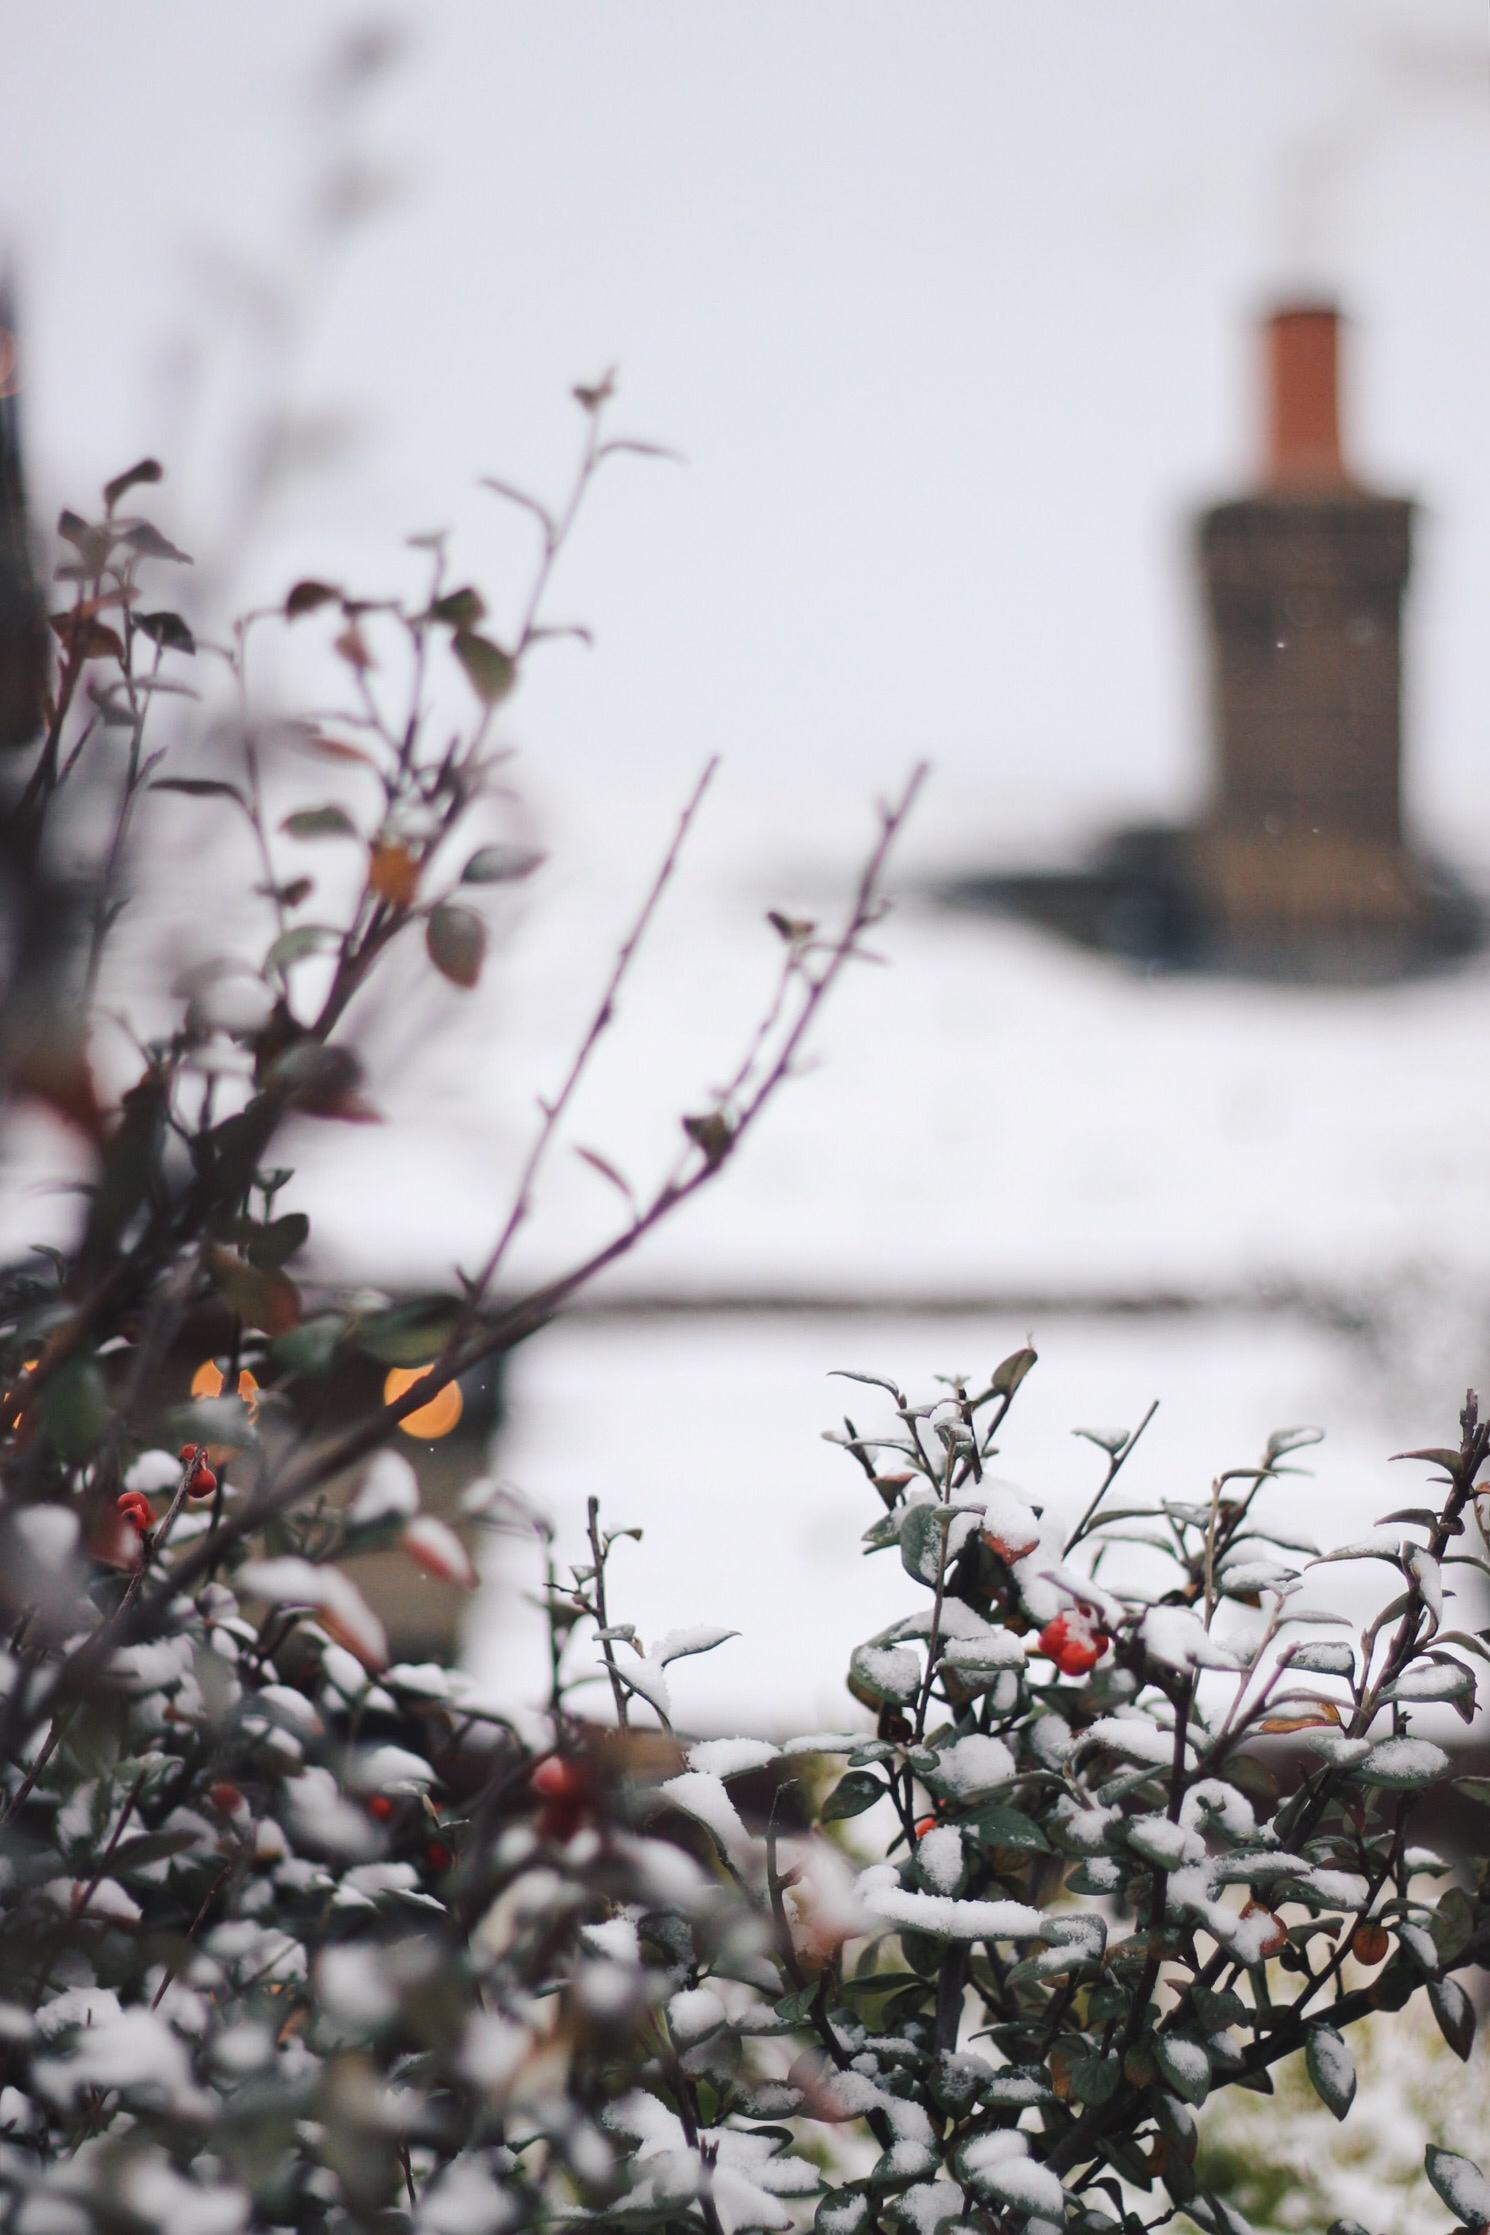 Snow Chimney Roof